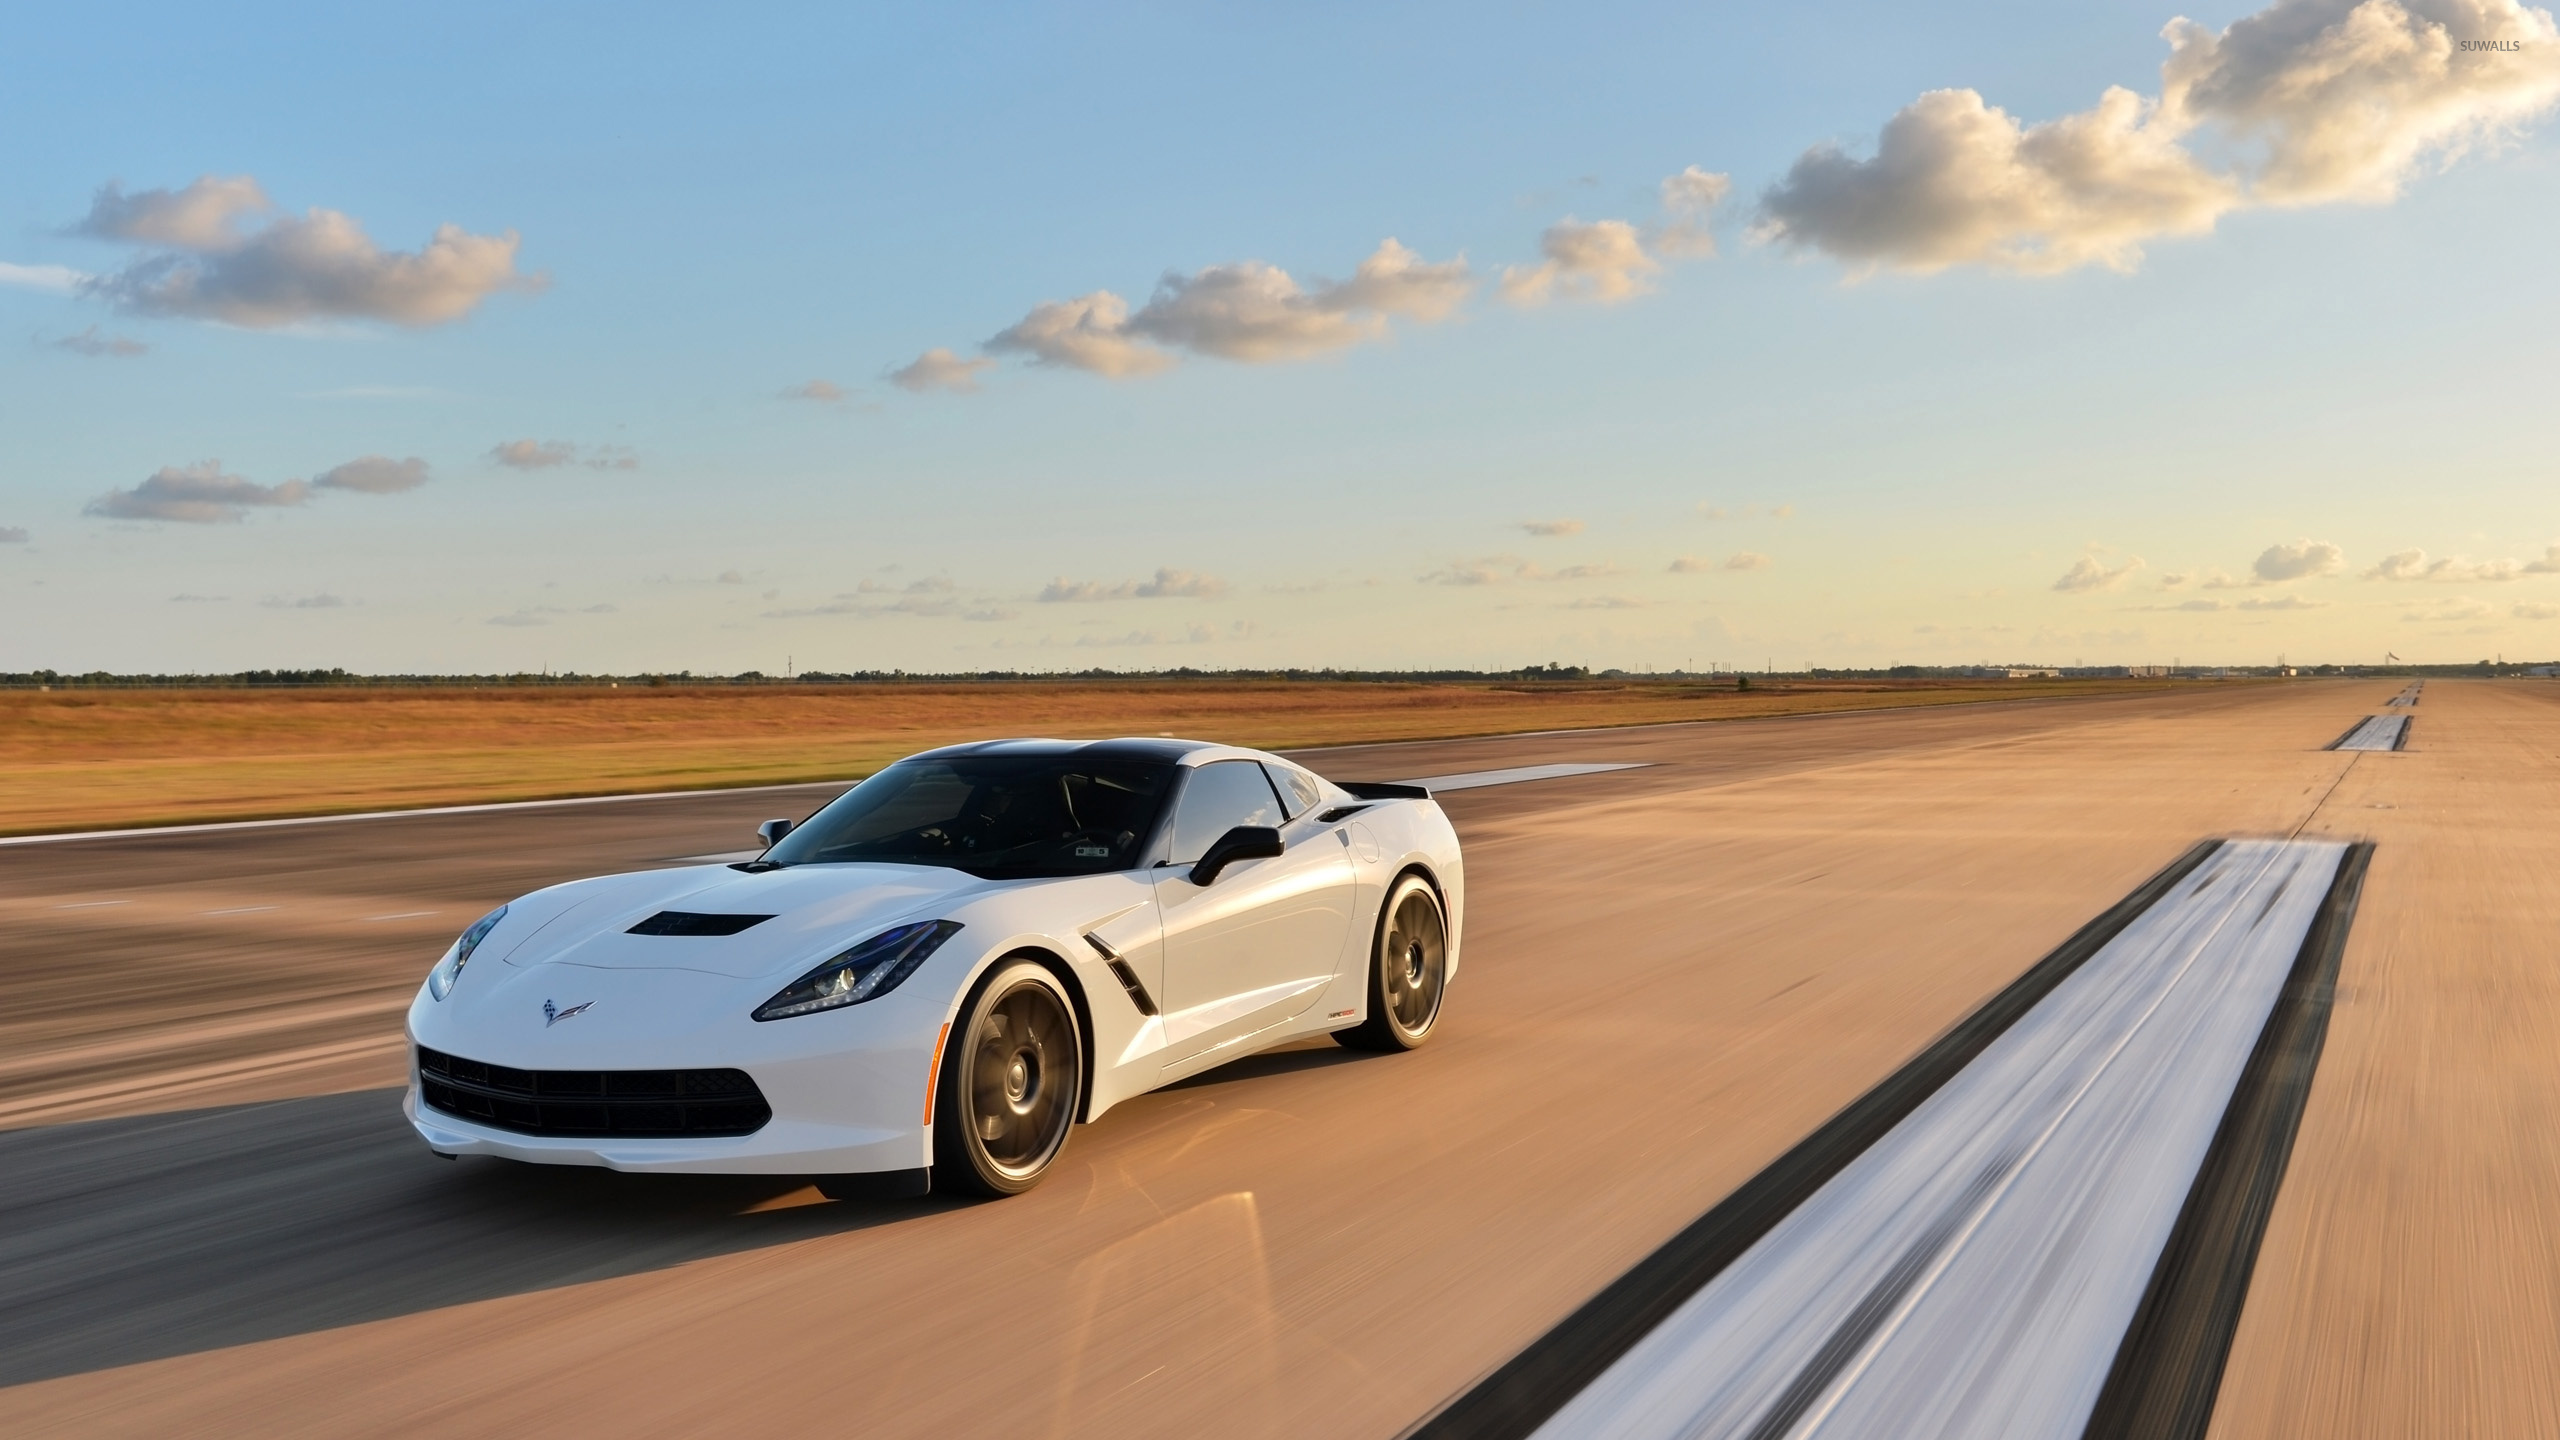 Chevrolet Corvette Wallpapers High Resolution 327BD4I 2560x1440